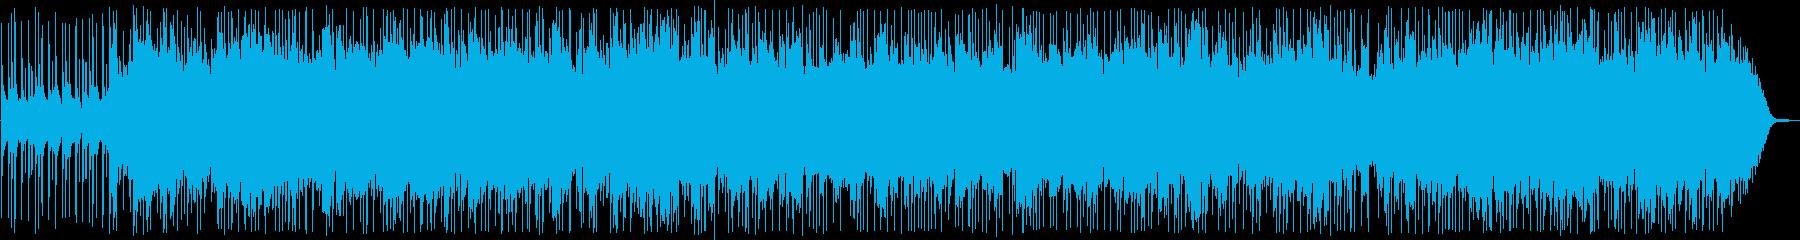 Shuri Akada (Akaterasu Doinchi)'s reproduced waveform